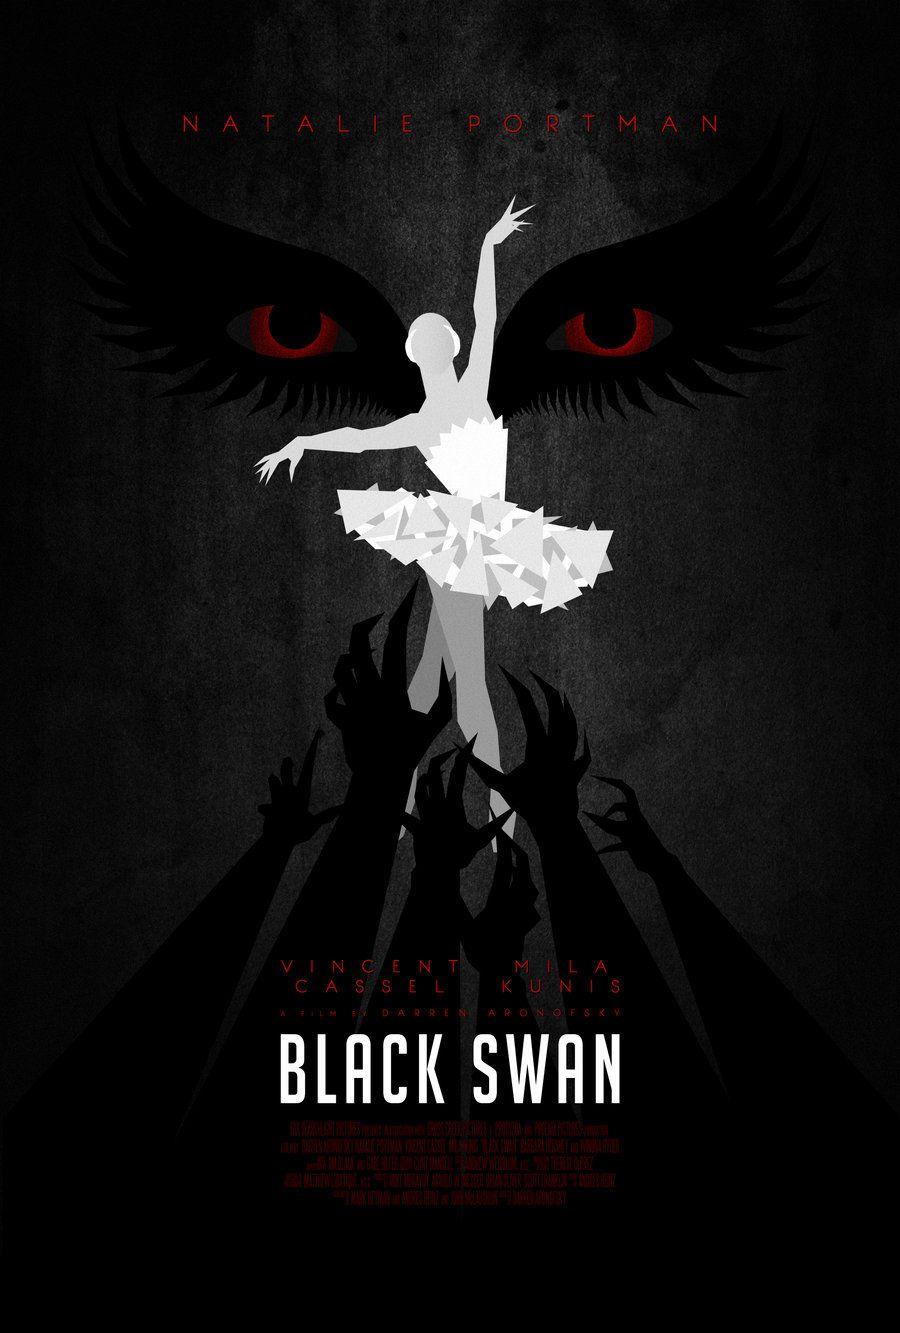 Poster design deviantart - Black Swan Poster By Drmierzwiak On Deviantart